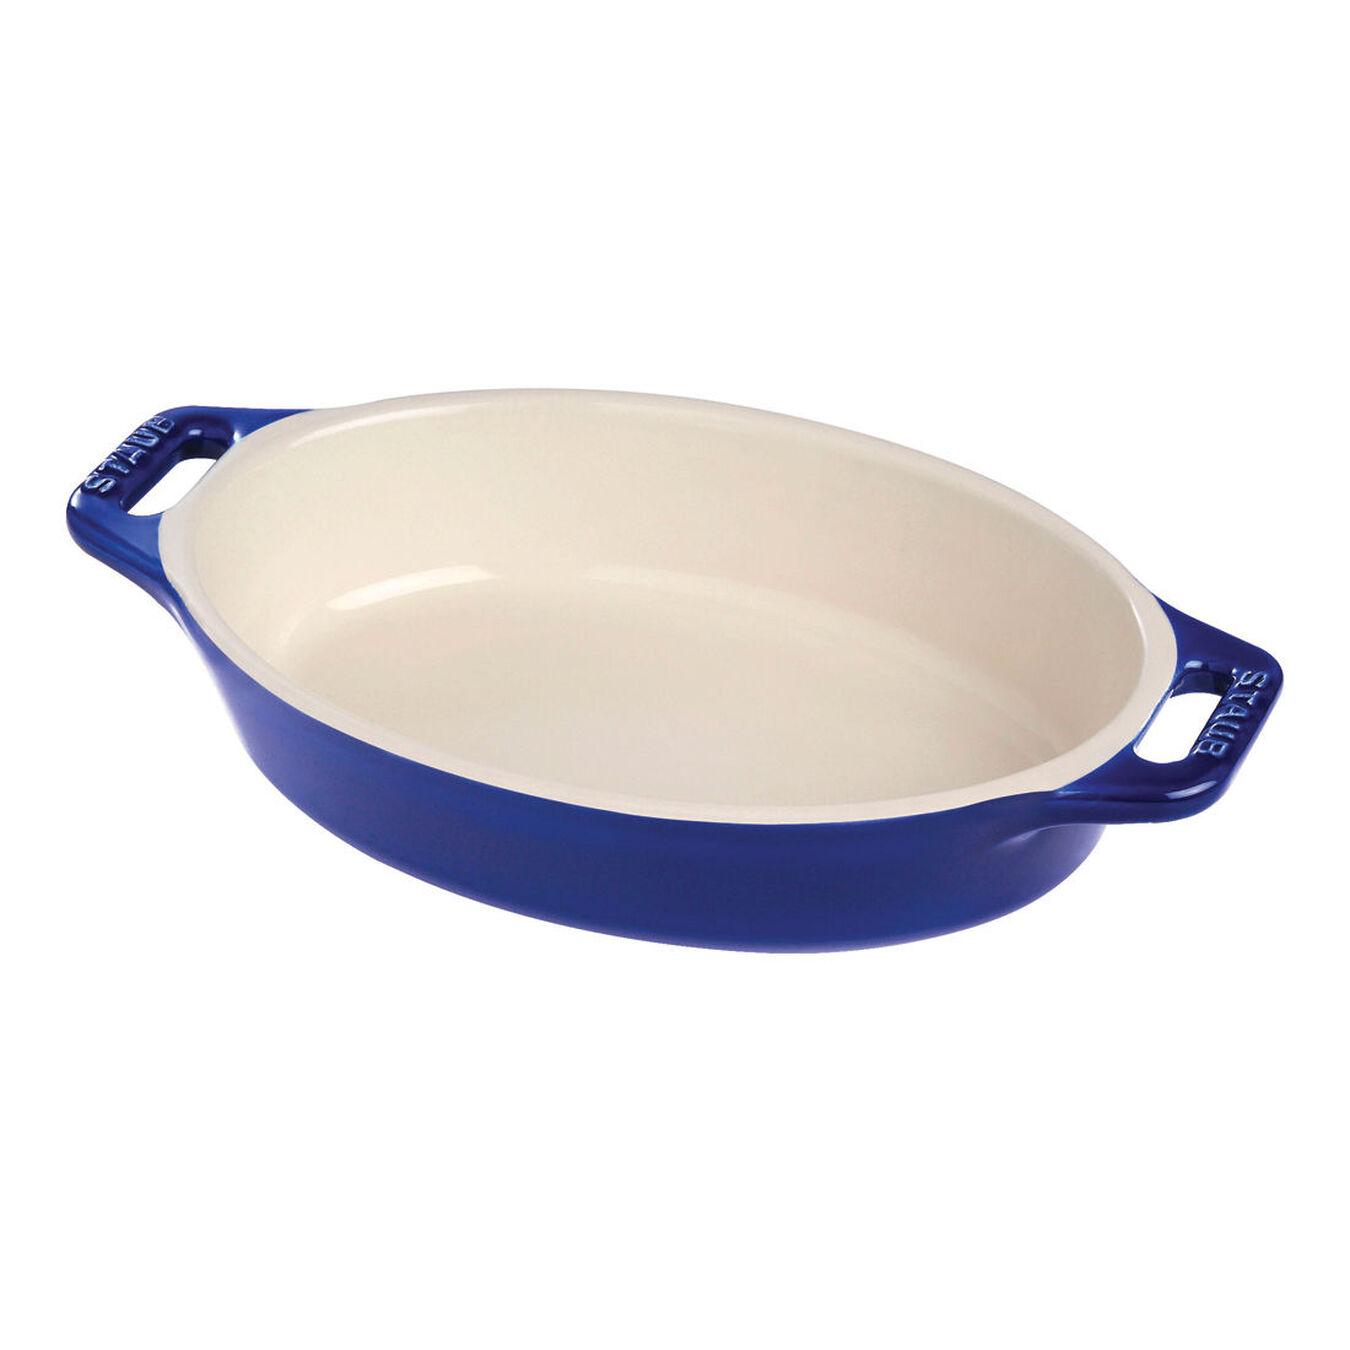 14.5-inch, oval, Special shape bakeware, dark blue,,large 1